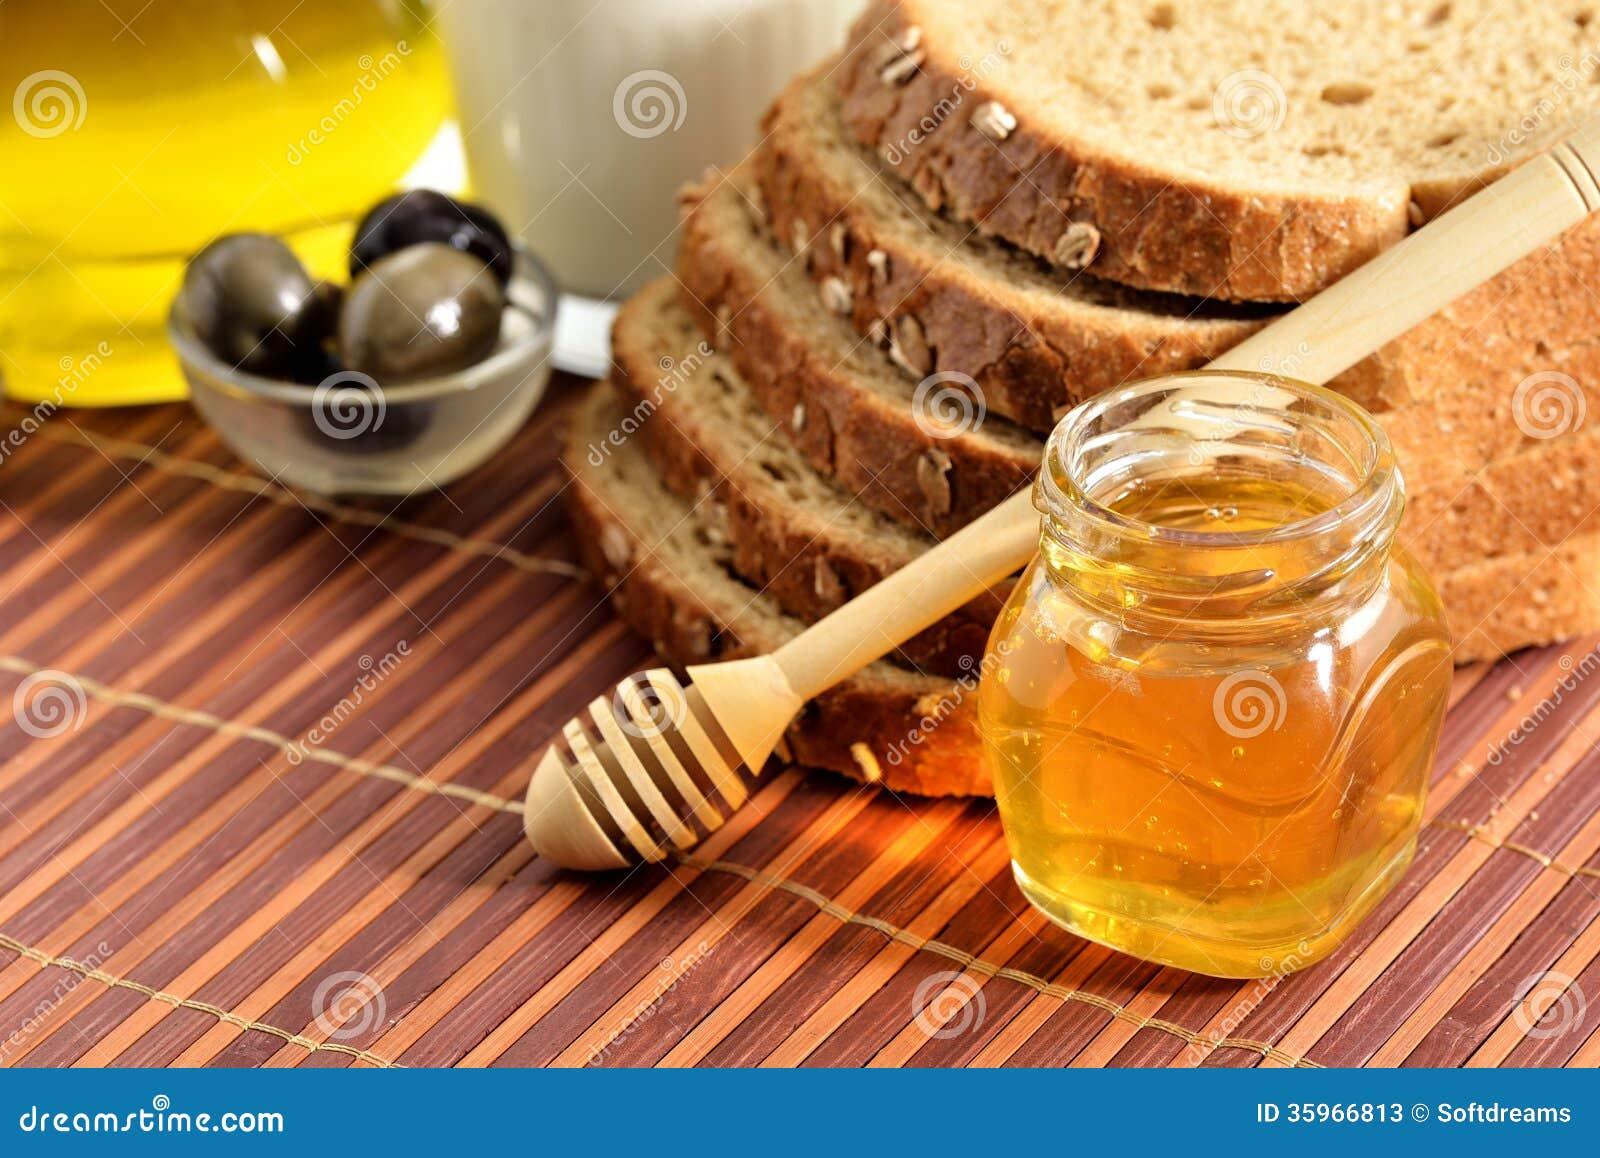 Aceite de oliva, pan, ajo